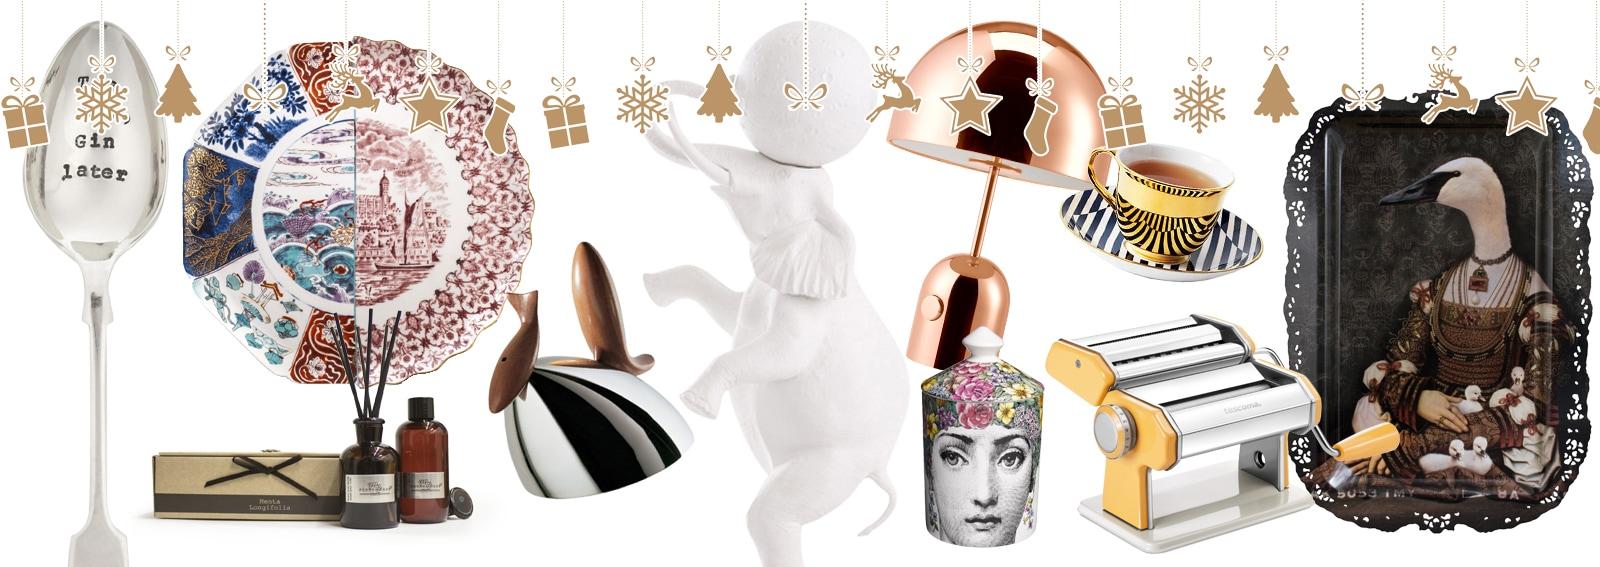 cover-regali-natale-mamma-design-2017-desktop